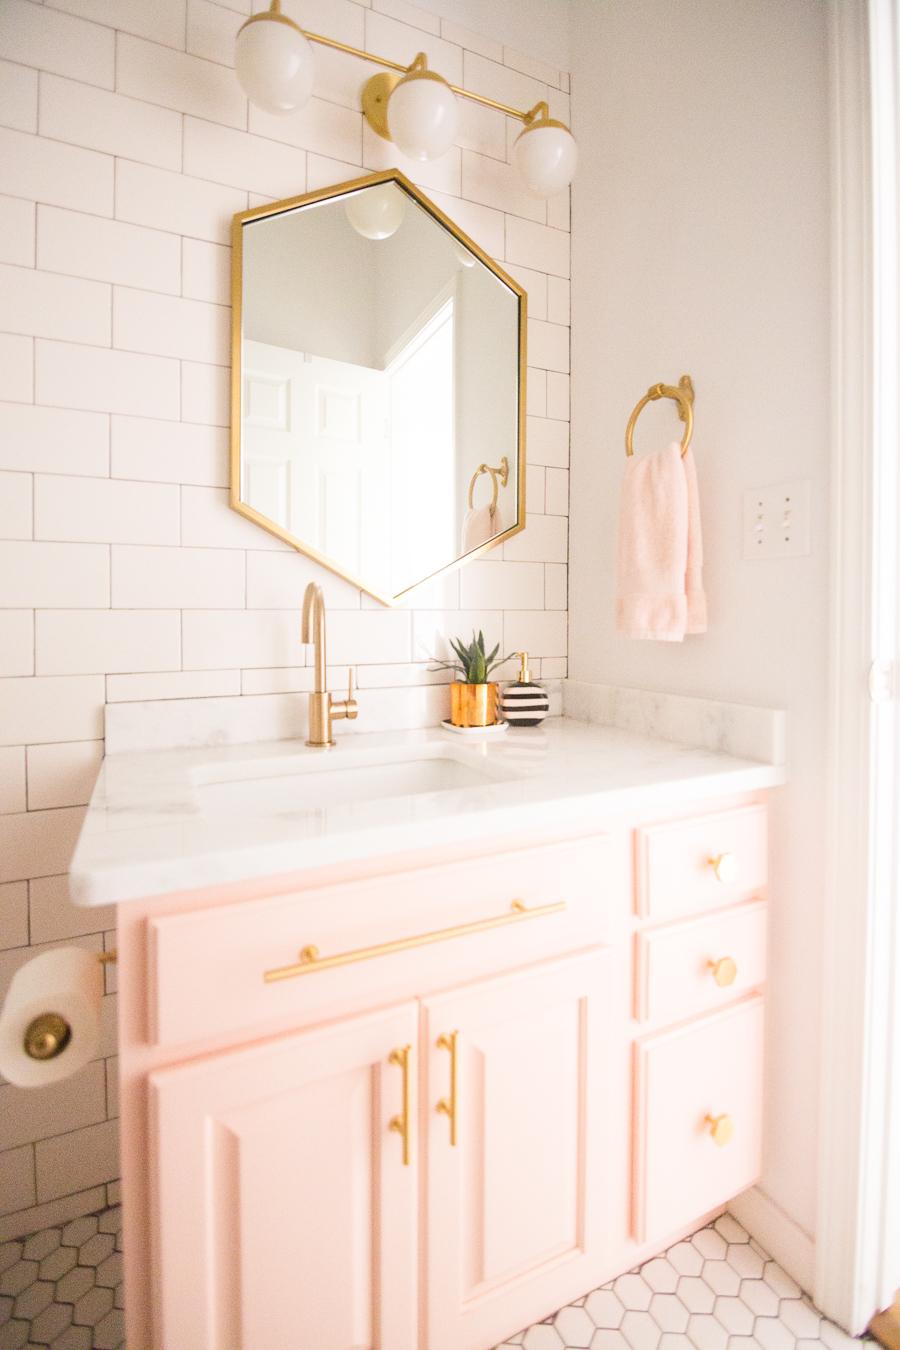 salle de bain feminine et elegante rose et or